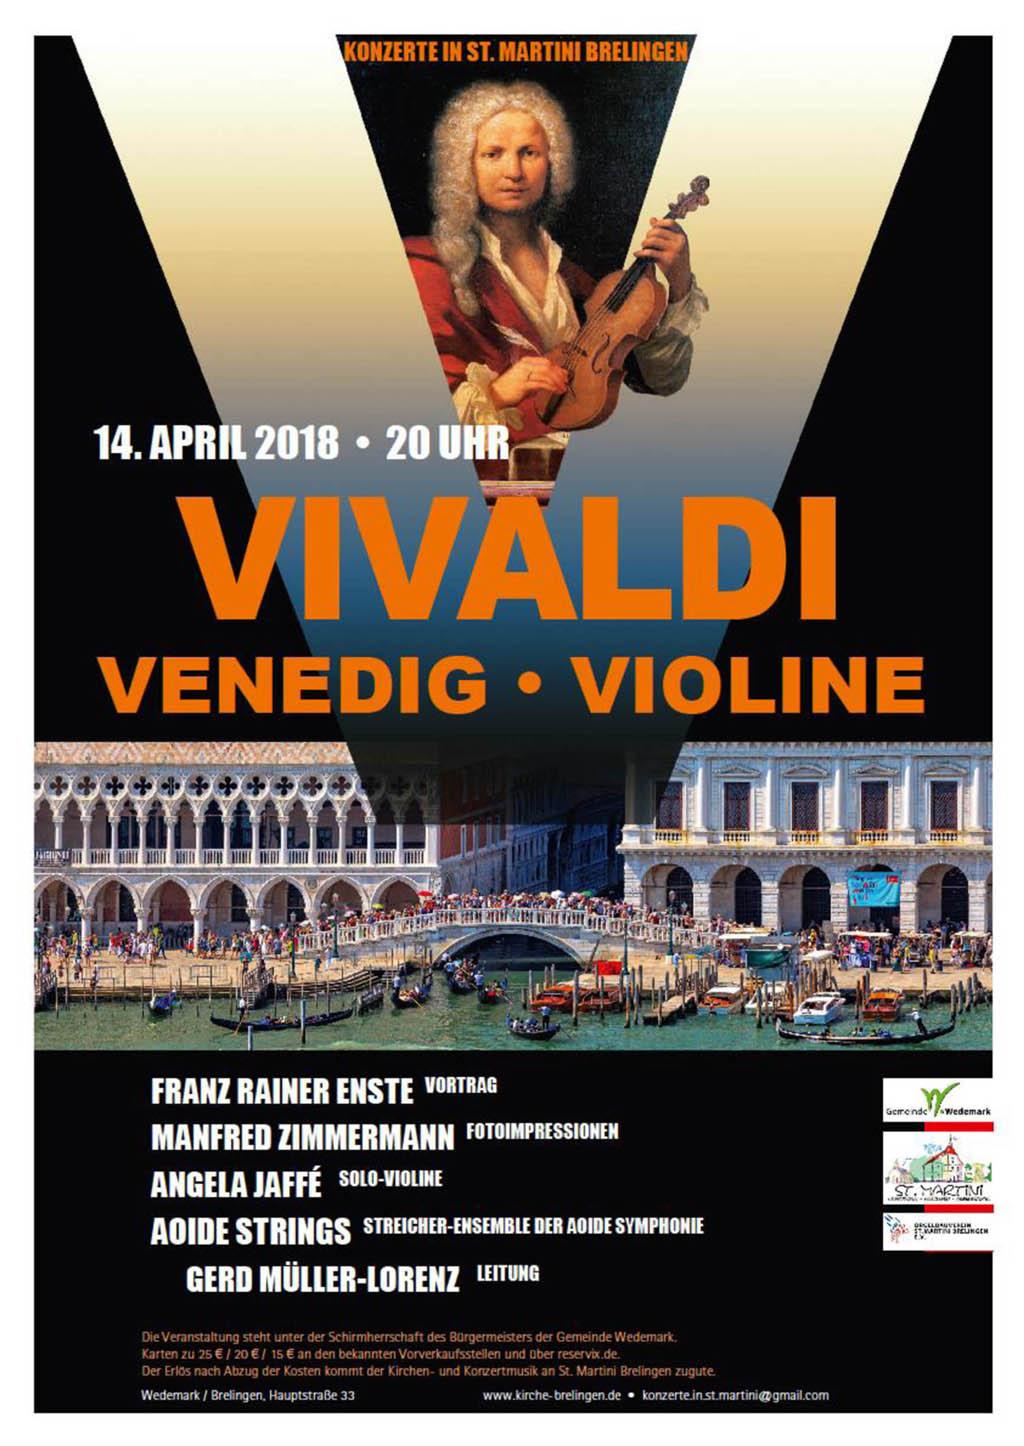 Vivaldi - Venedig - Violine Plakat